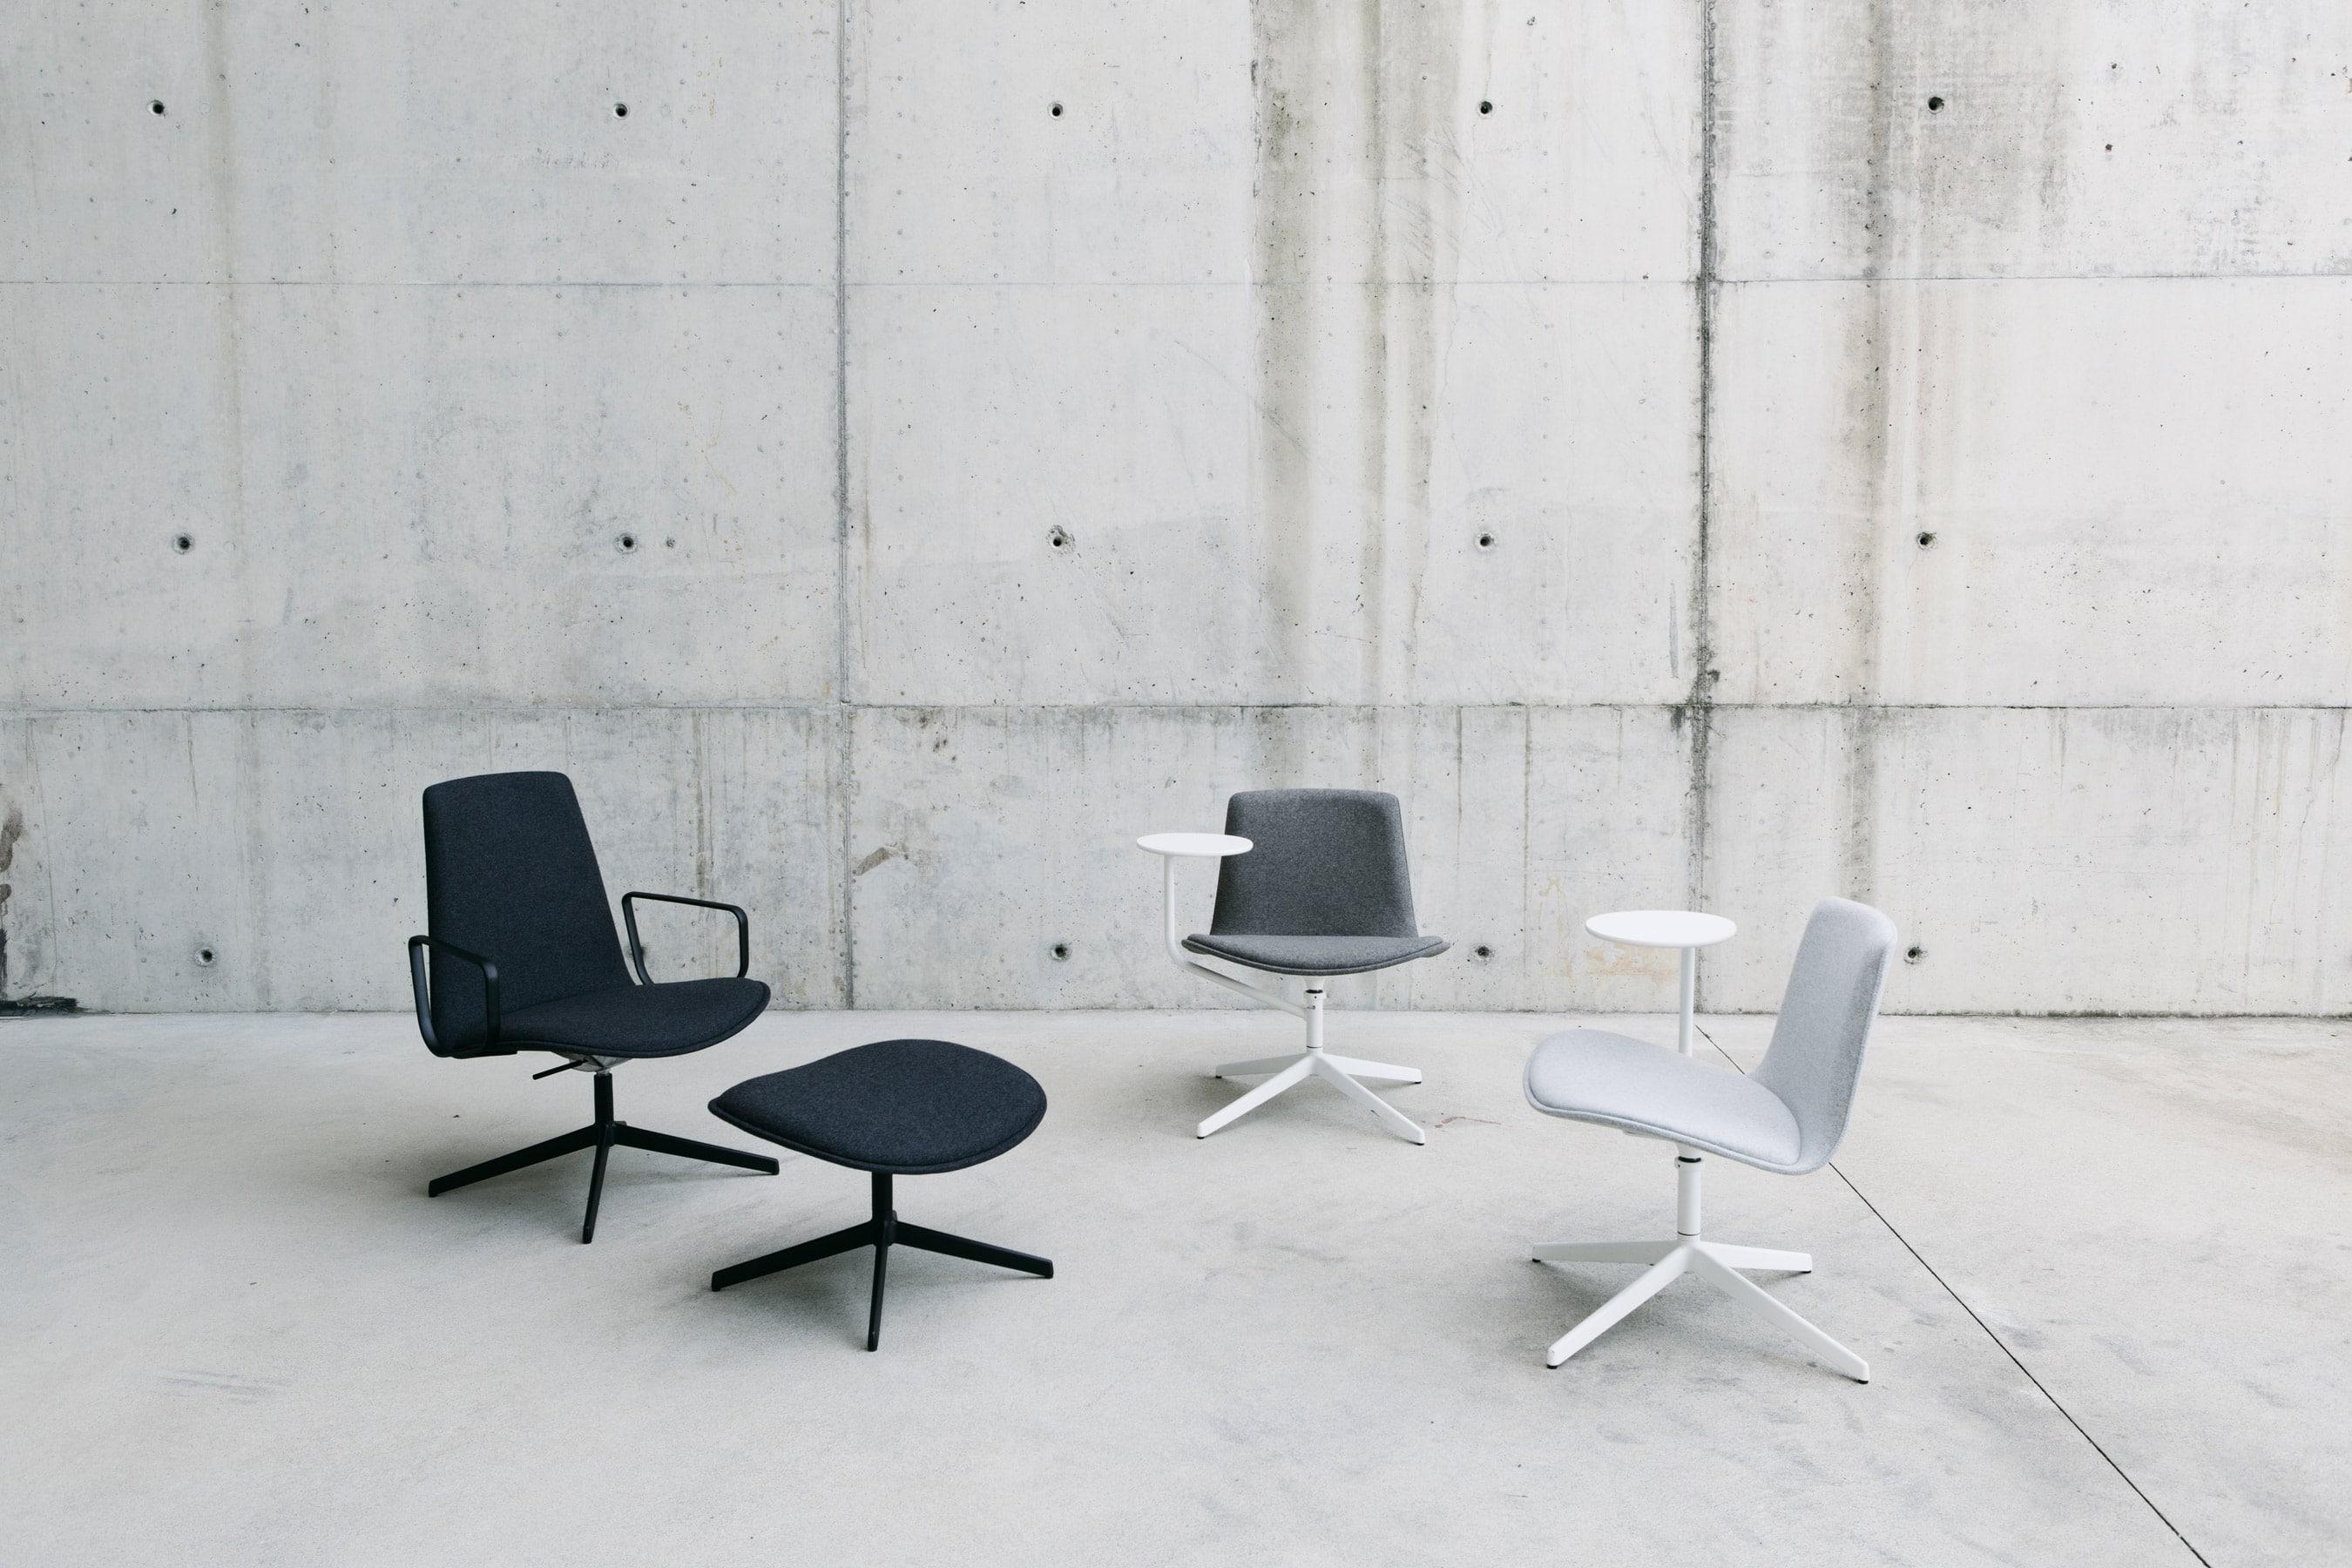 Lottus Lounge colección